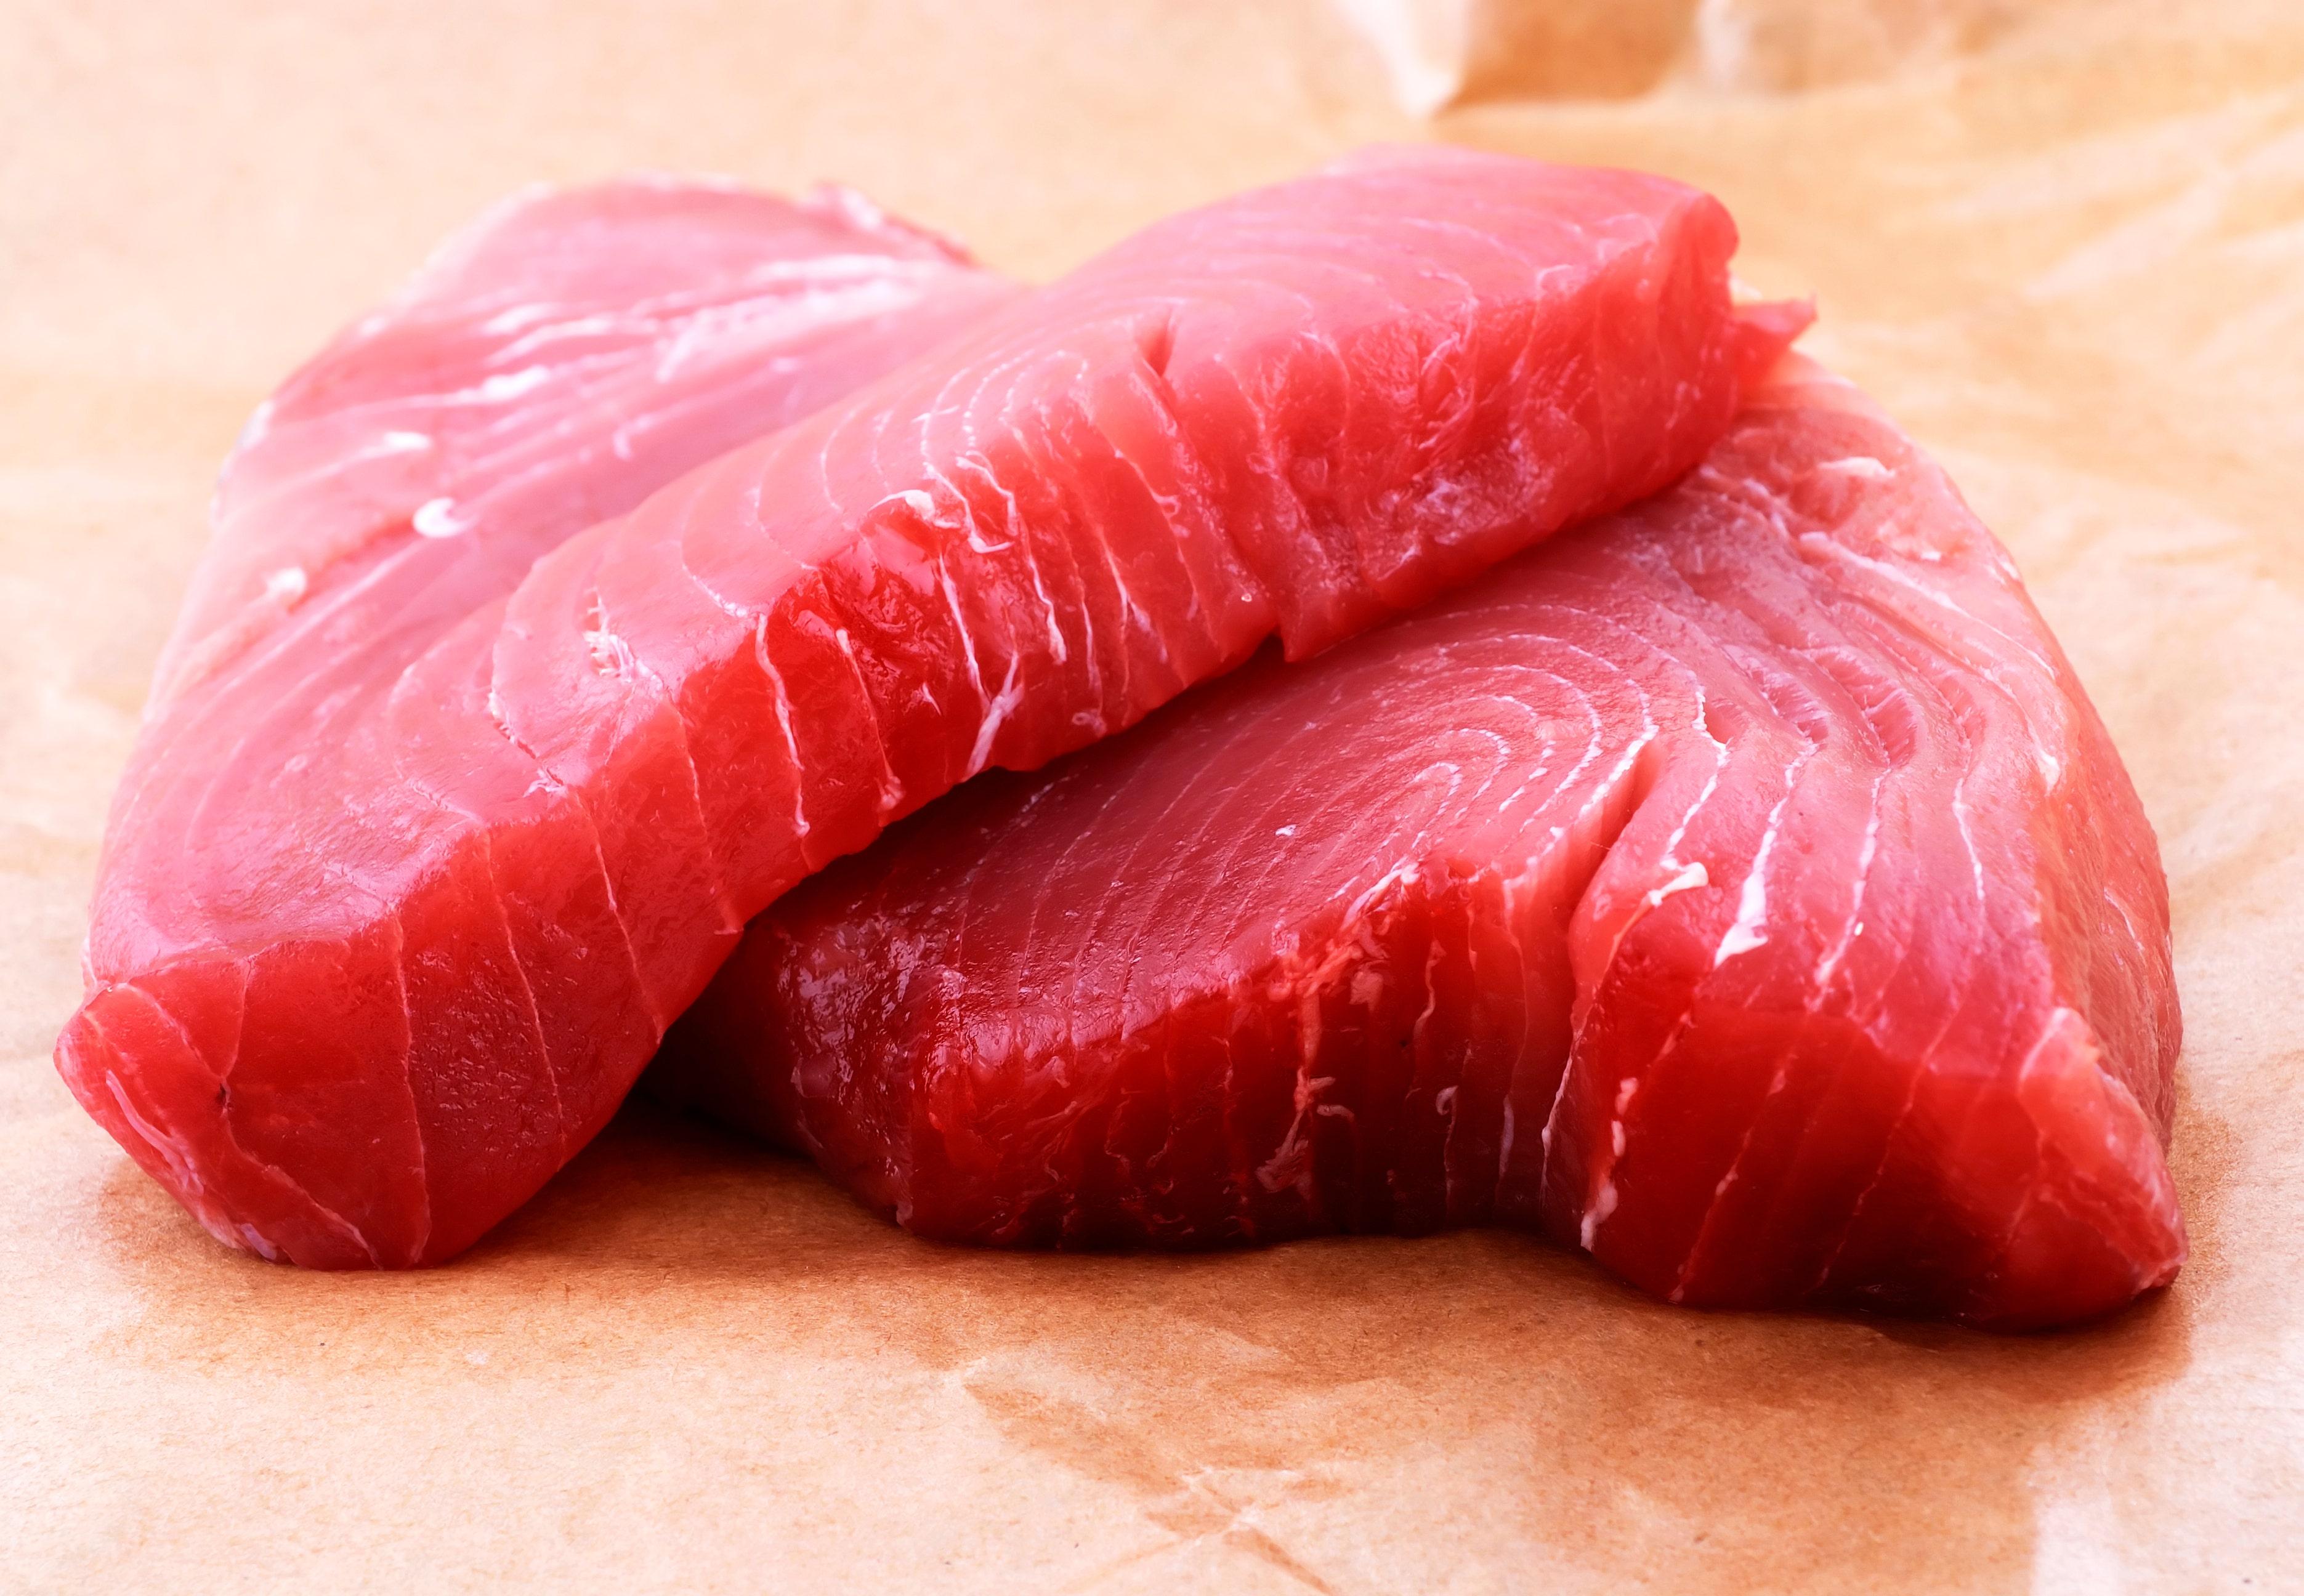 Westlake Legal Group raw_tuna_istock Frozen tuna sold in New York, Connecticut recalled amid salmonella outbreak fox-news/health/infectious-disease/foodborne-illness fox-news/health/healthy-living/product-recalls fox news fnc/health fnc d9520ad2-9ff9-5172-8336-1d26b100117a article Alexandria Hein